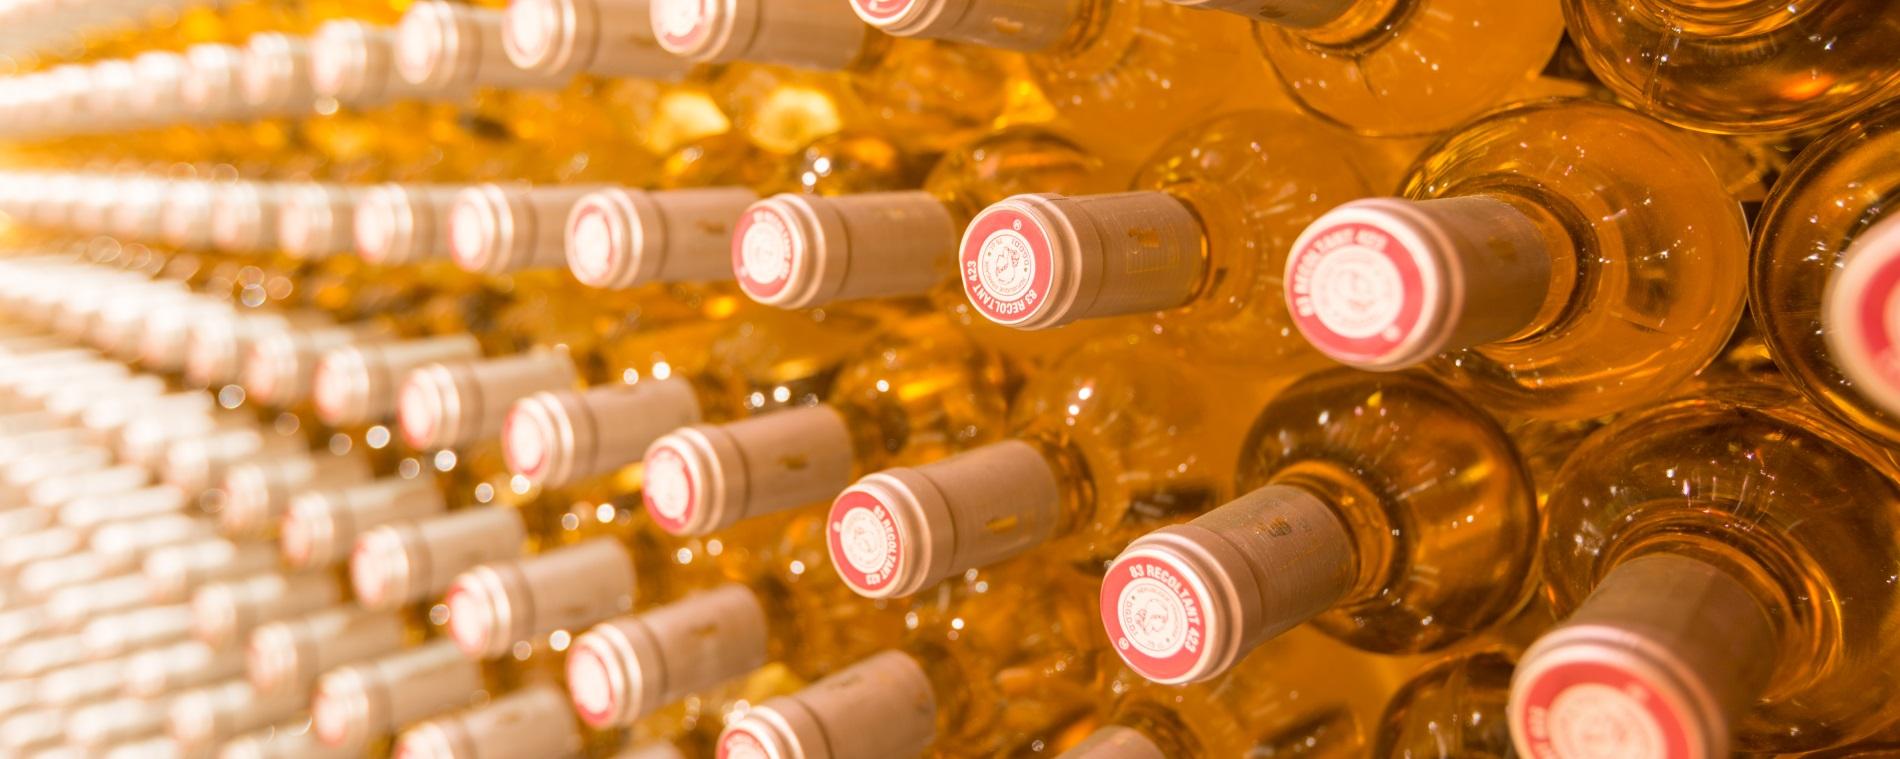 vins-blancs-provence